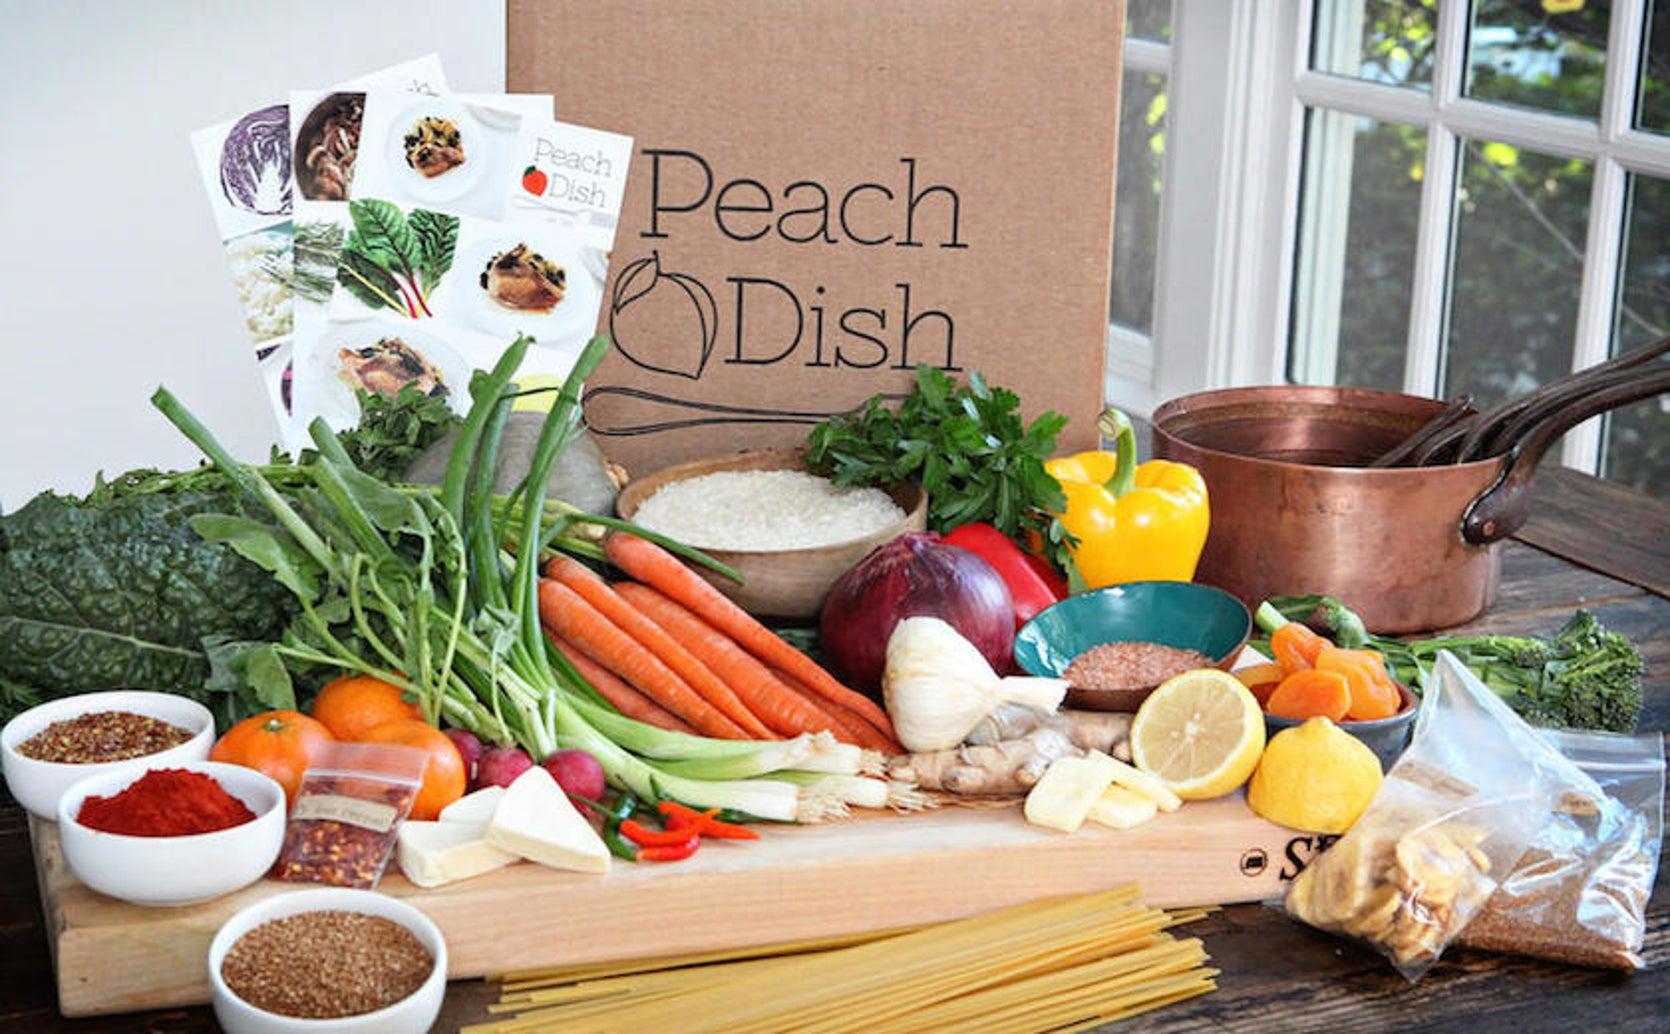 Peach Dish page